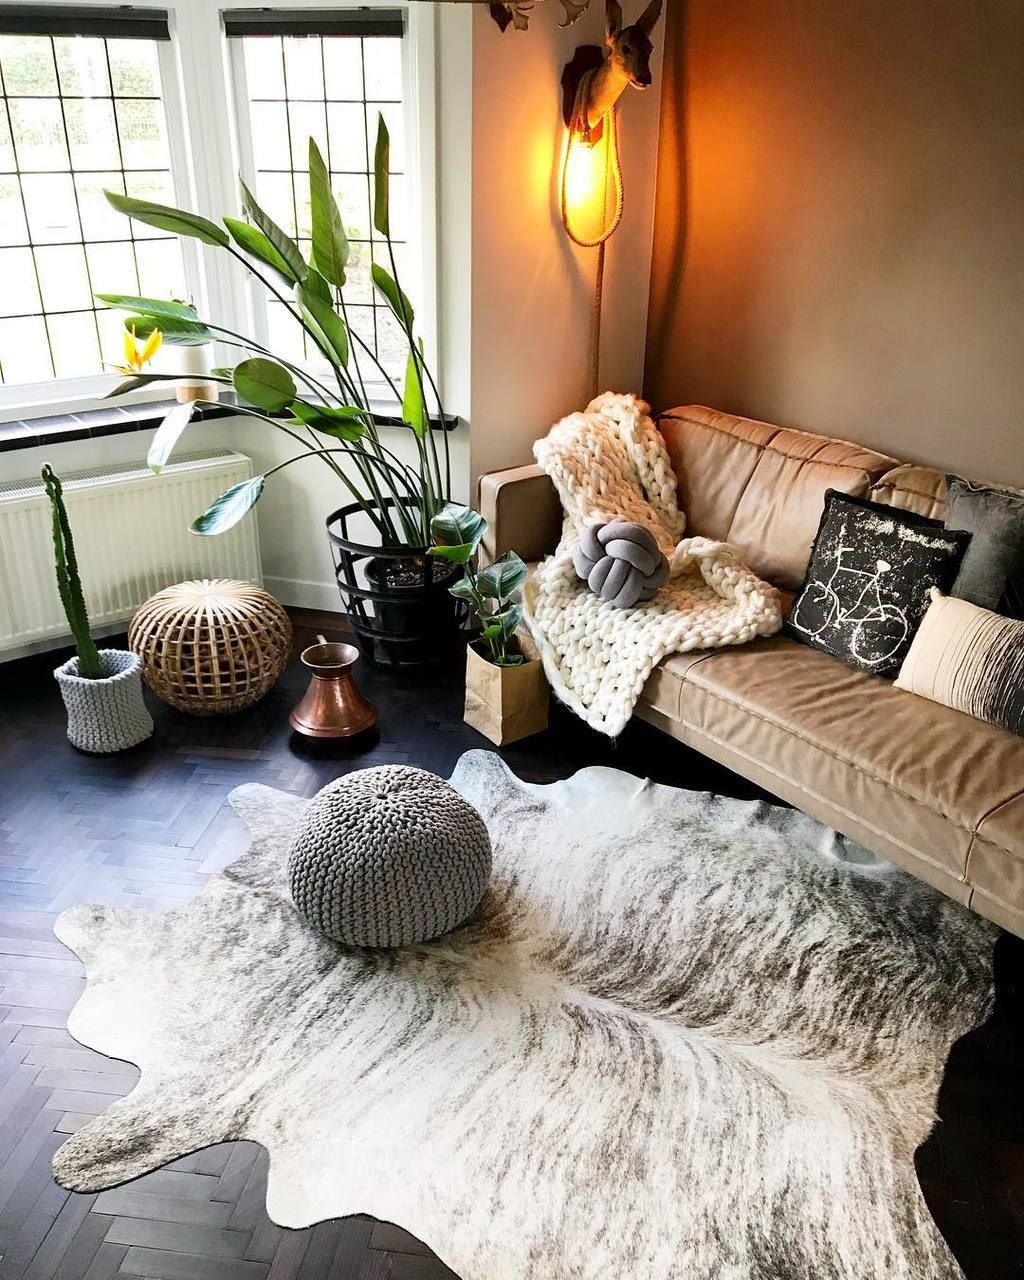 Light Brindle Brazilian Cowhide Rug Large Cowhide Rug Living Room Rugs In Living Room Hide Rug Living Room